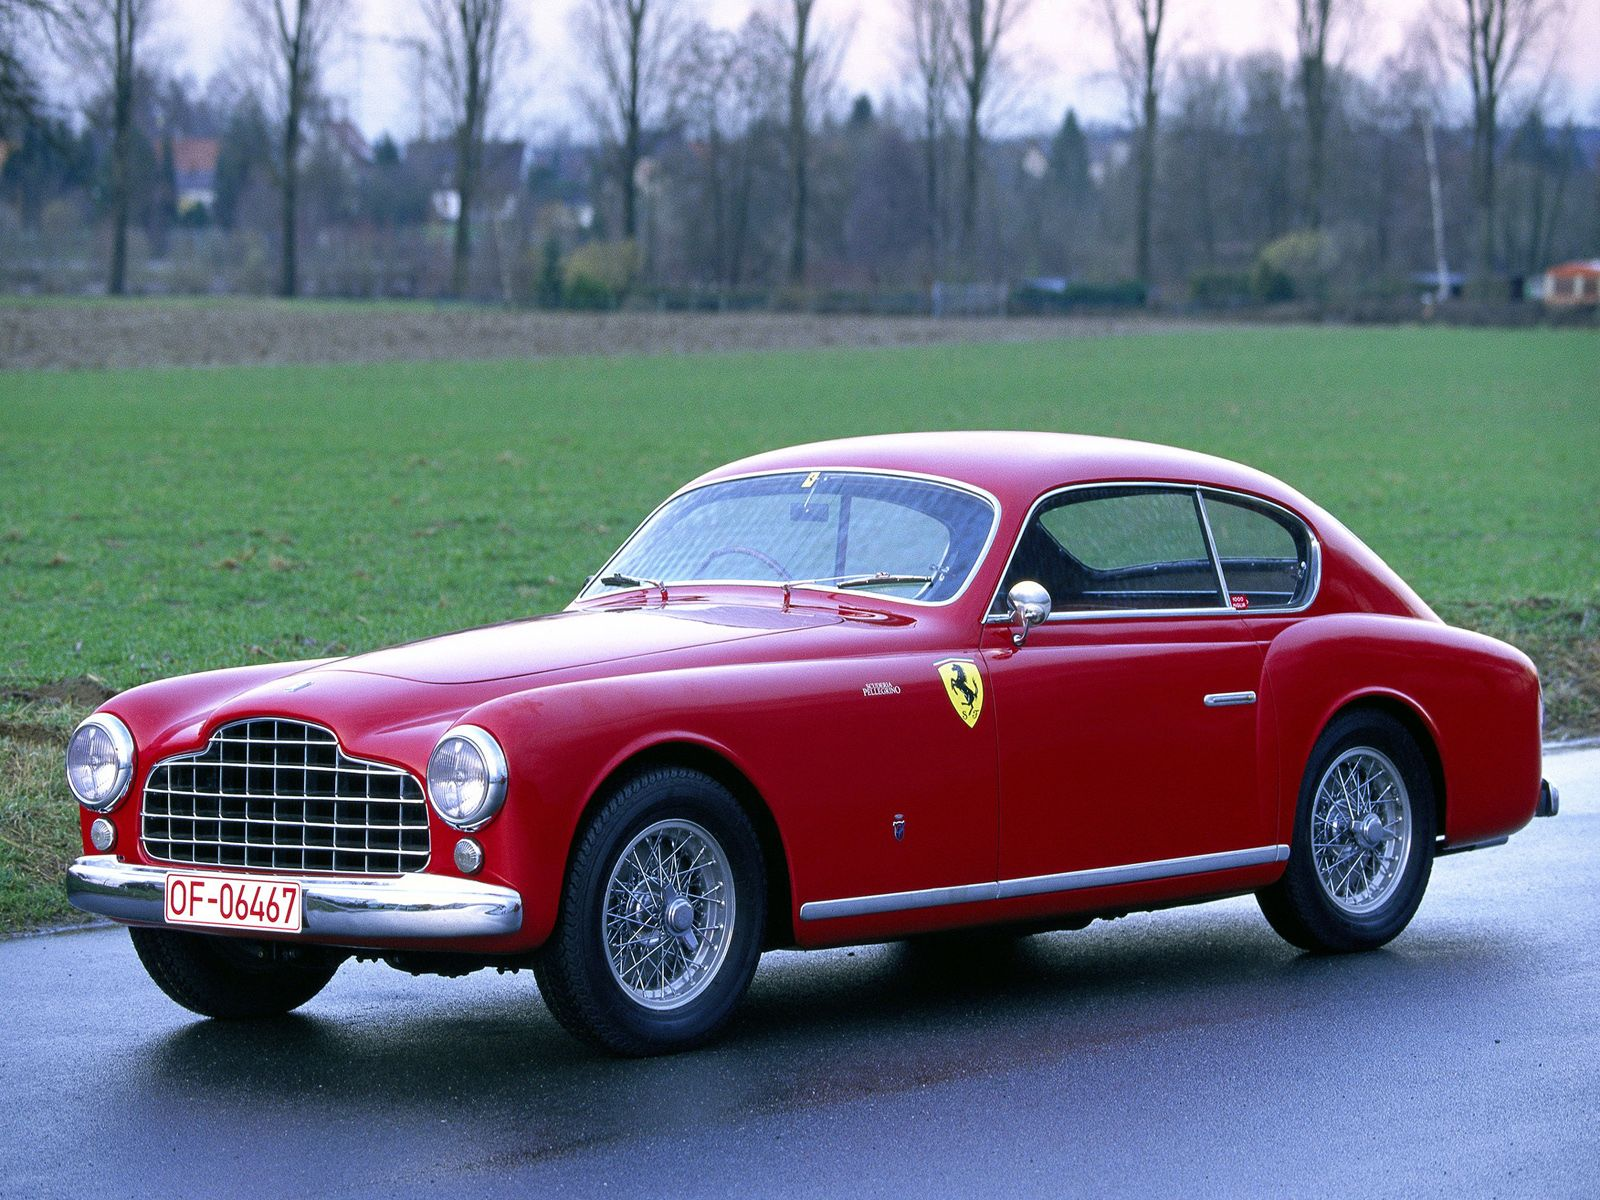 ba652169d74216866ee887f3c0f8dfca Gorgeous Ferrari Mondial 3.2 Cabriolet V8 Quattrovalvole Cars Trend